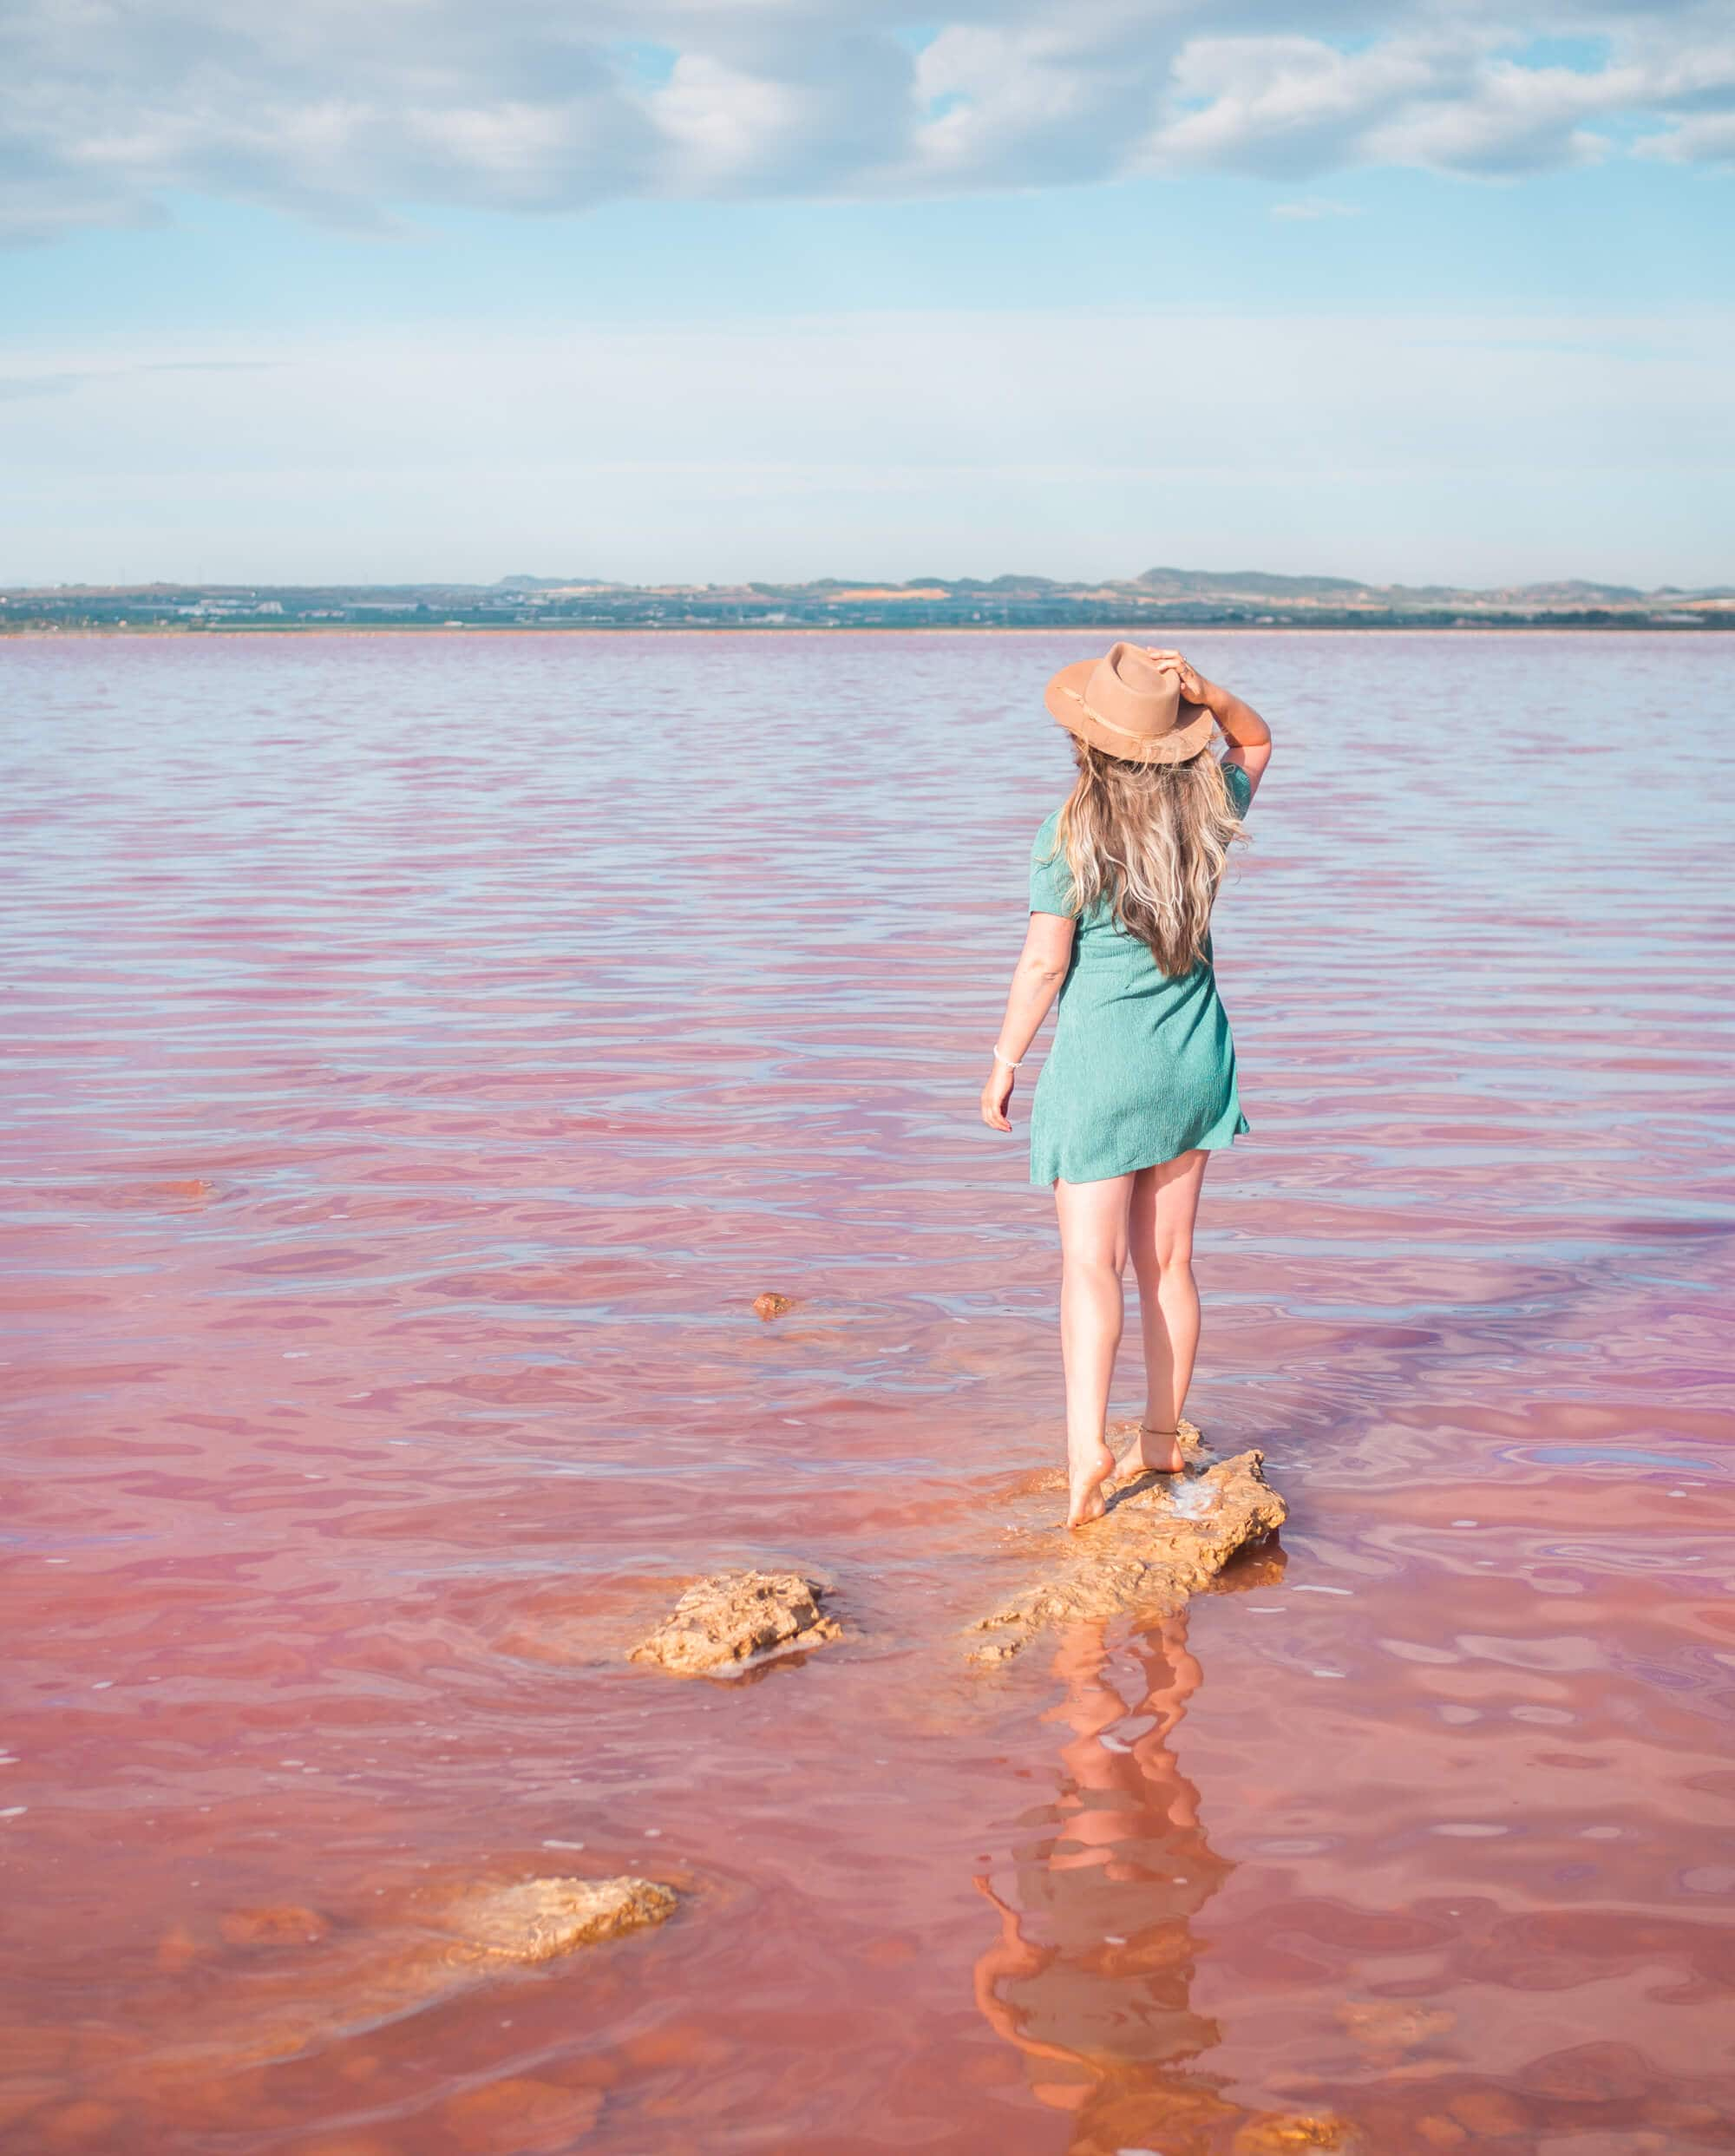 Laguna Salada de Torrevieja - A pink salt lake in Torrevieja, Spain #bucketlist #travelinspo #spain #torrevieja #pinklake